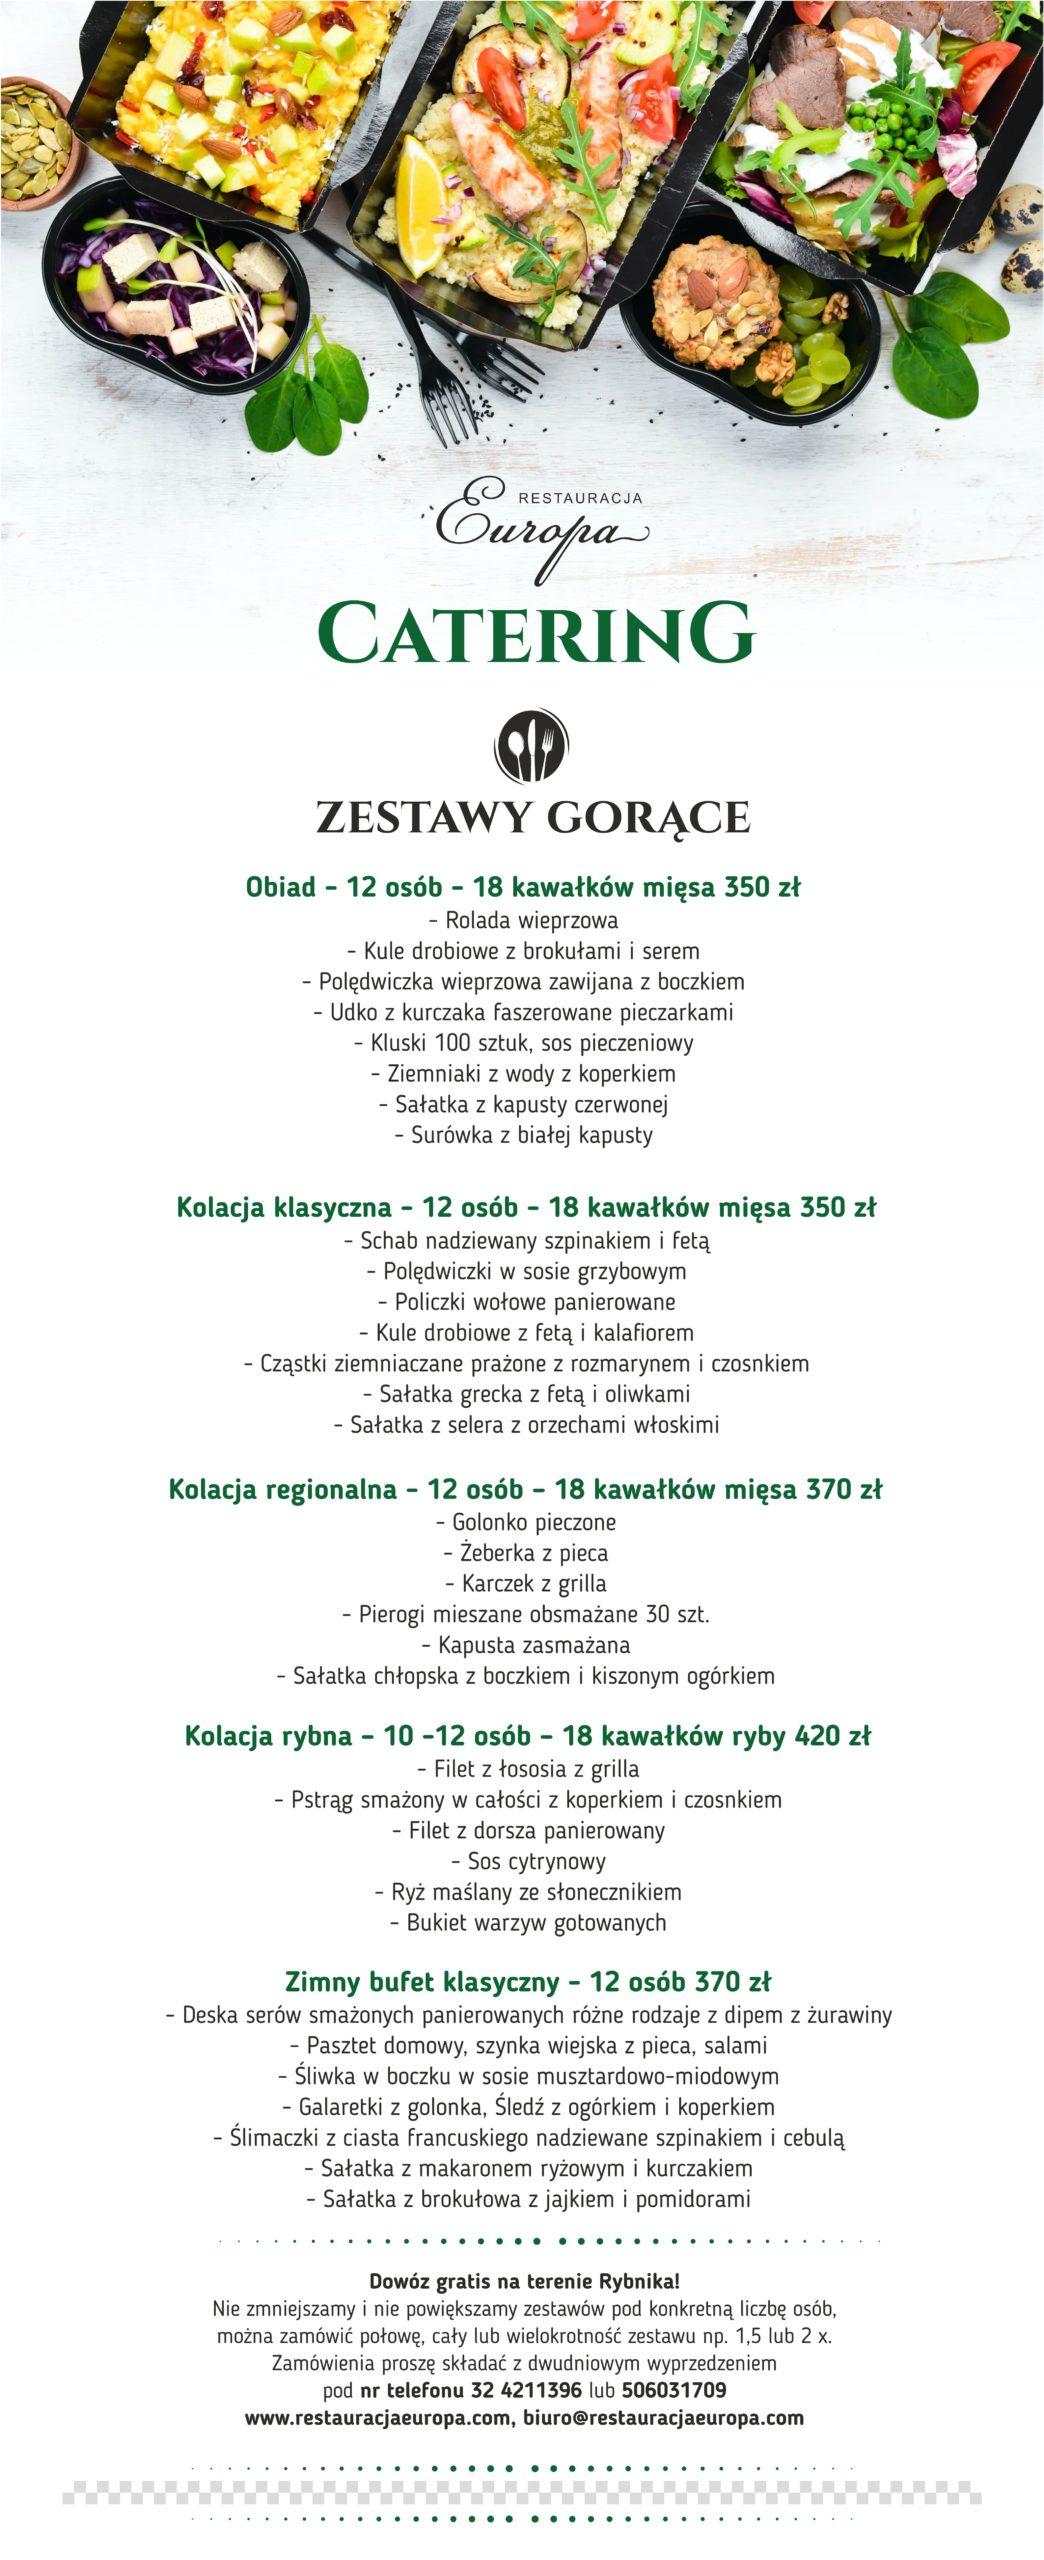 Catering 2020 | Restauracja Europa Rybnik